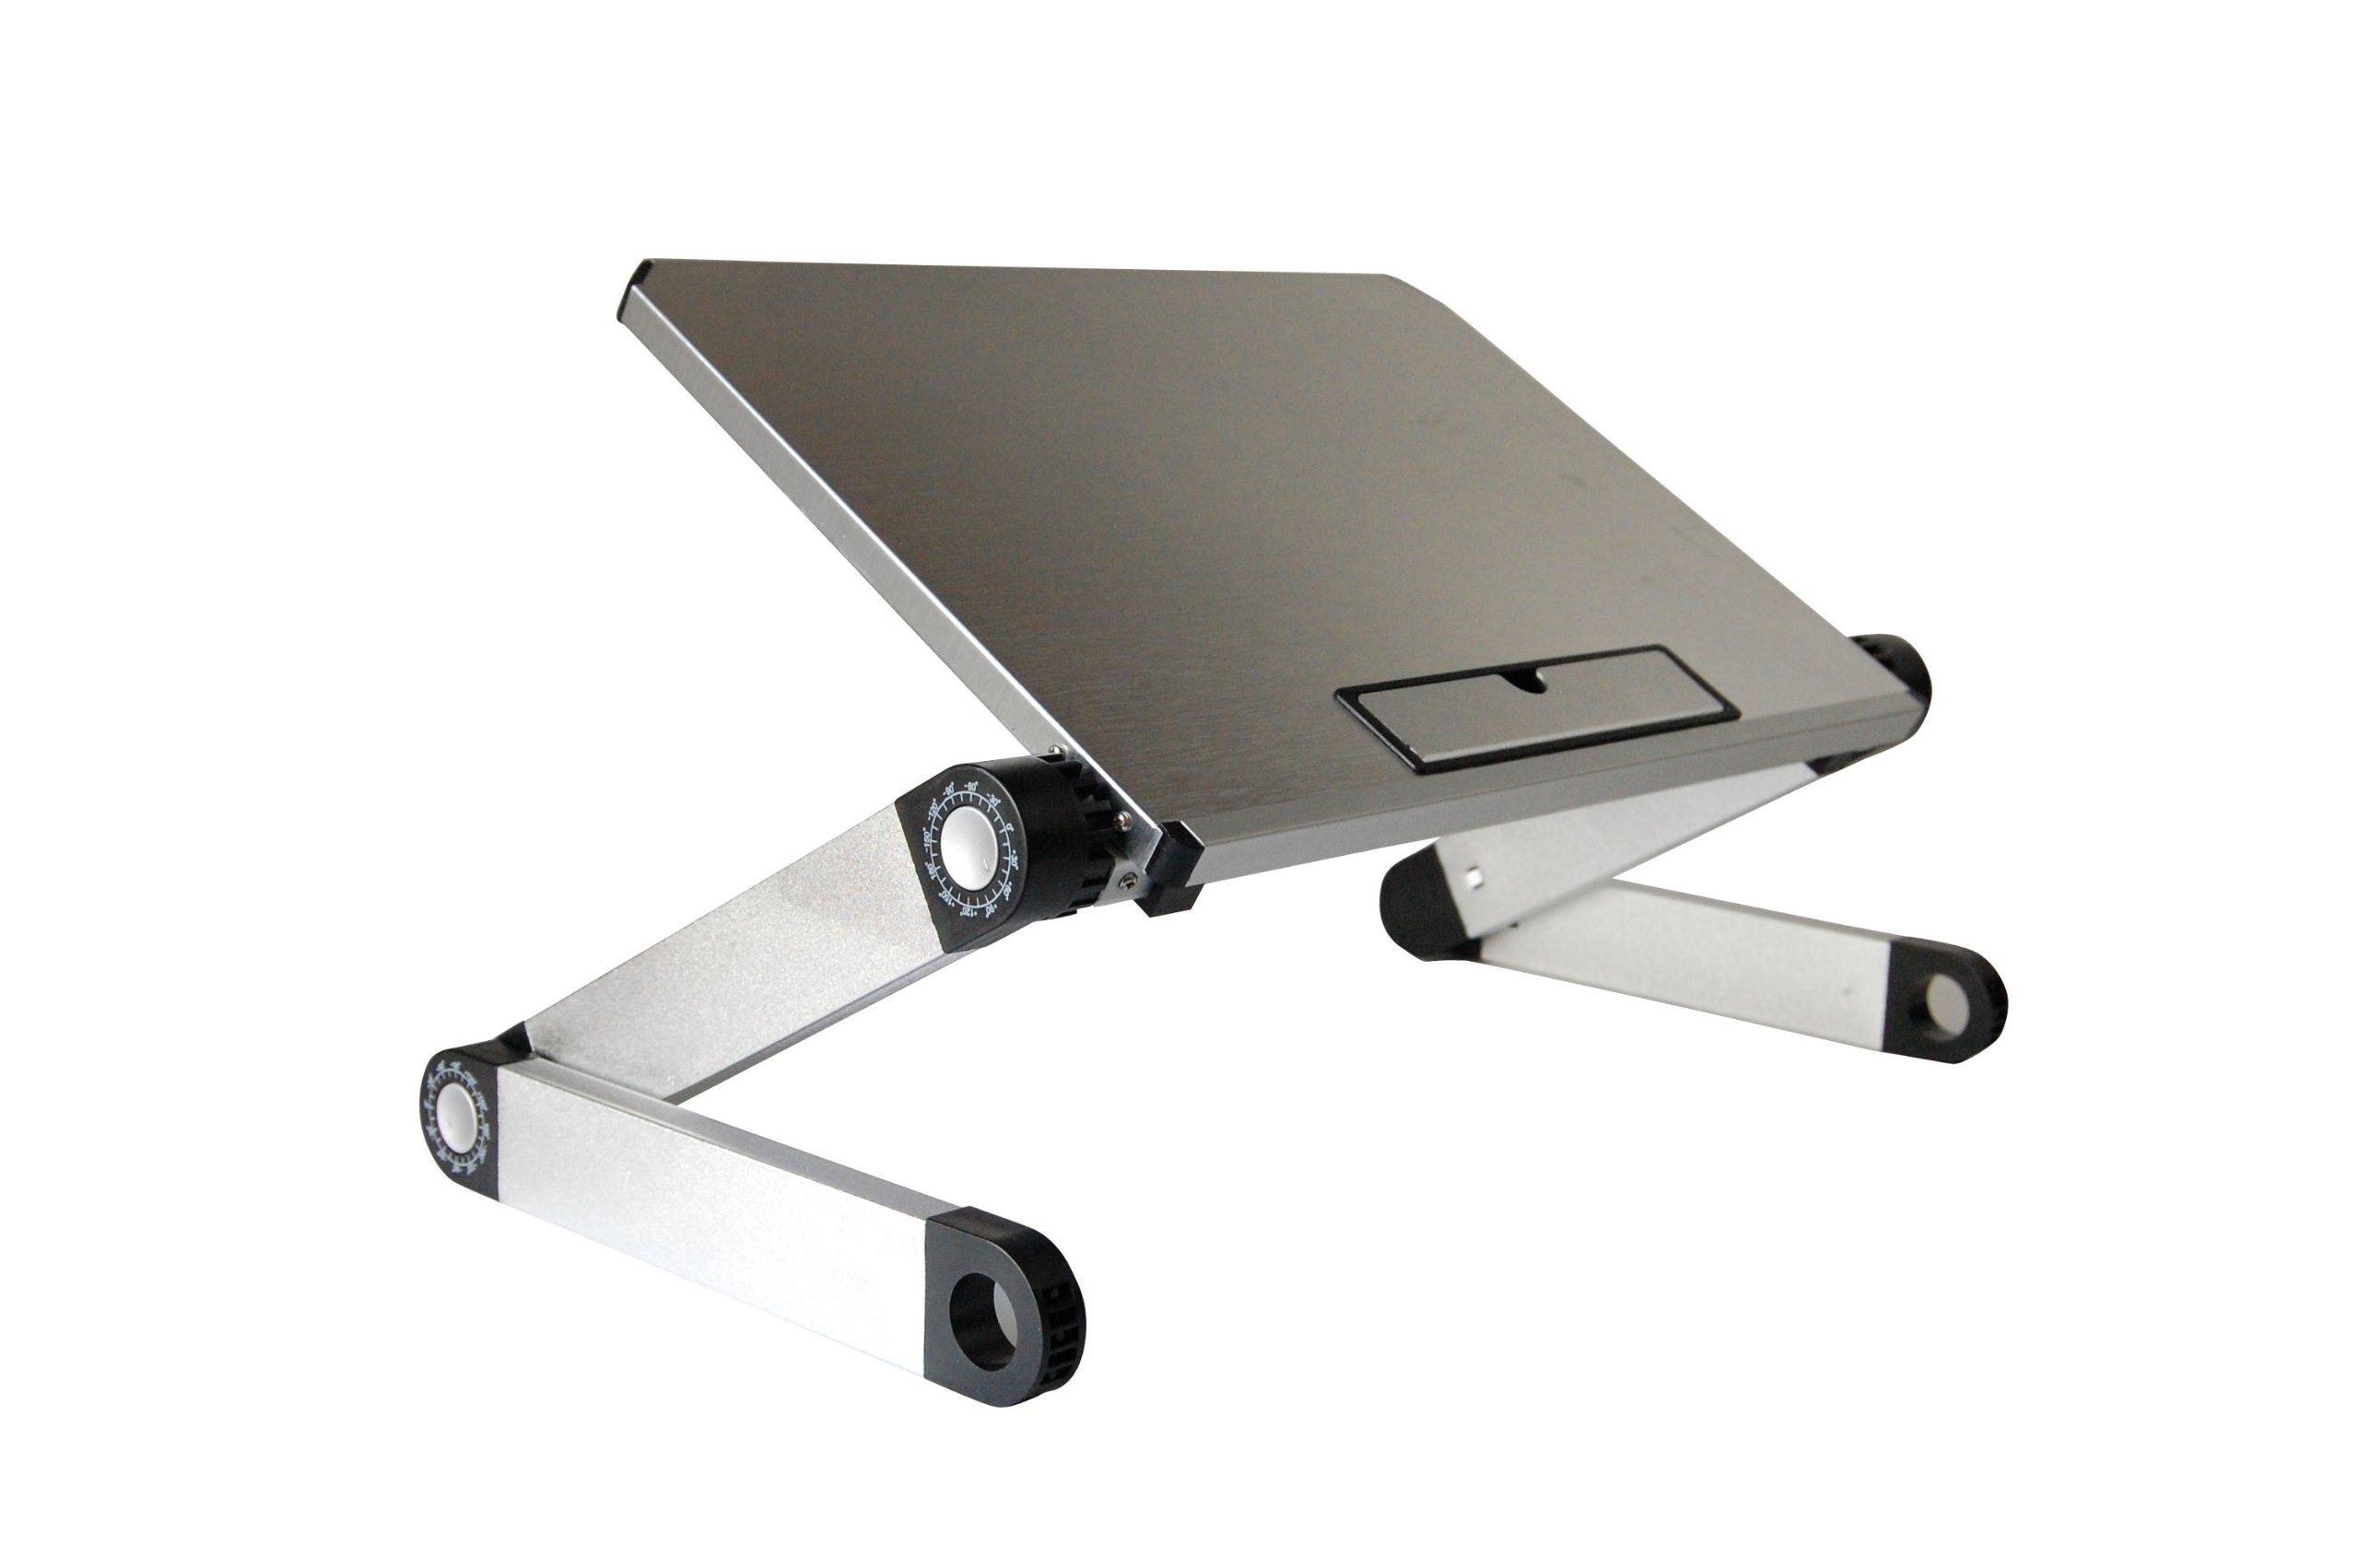 WorkEZ Light Ergonomic Portable Lightweight Aluminum Laptop Cooling Stand. Folding Adjustable Height & Angle Notebook Computer Riser Cooler Lap Desk